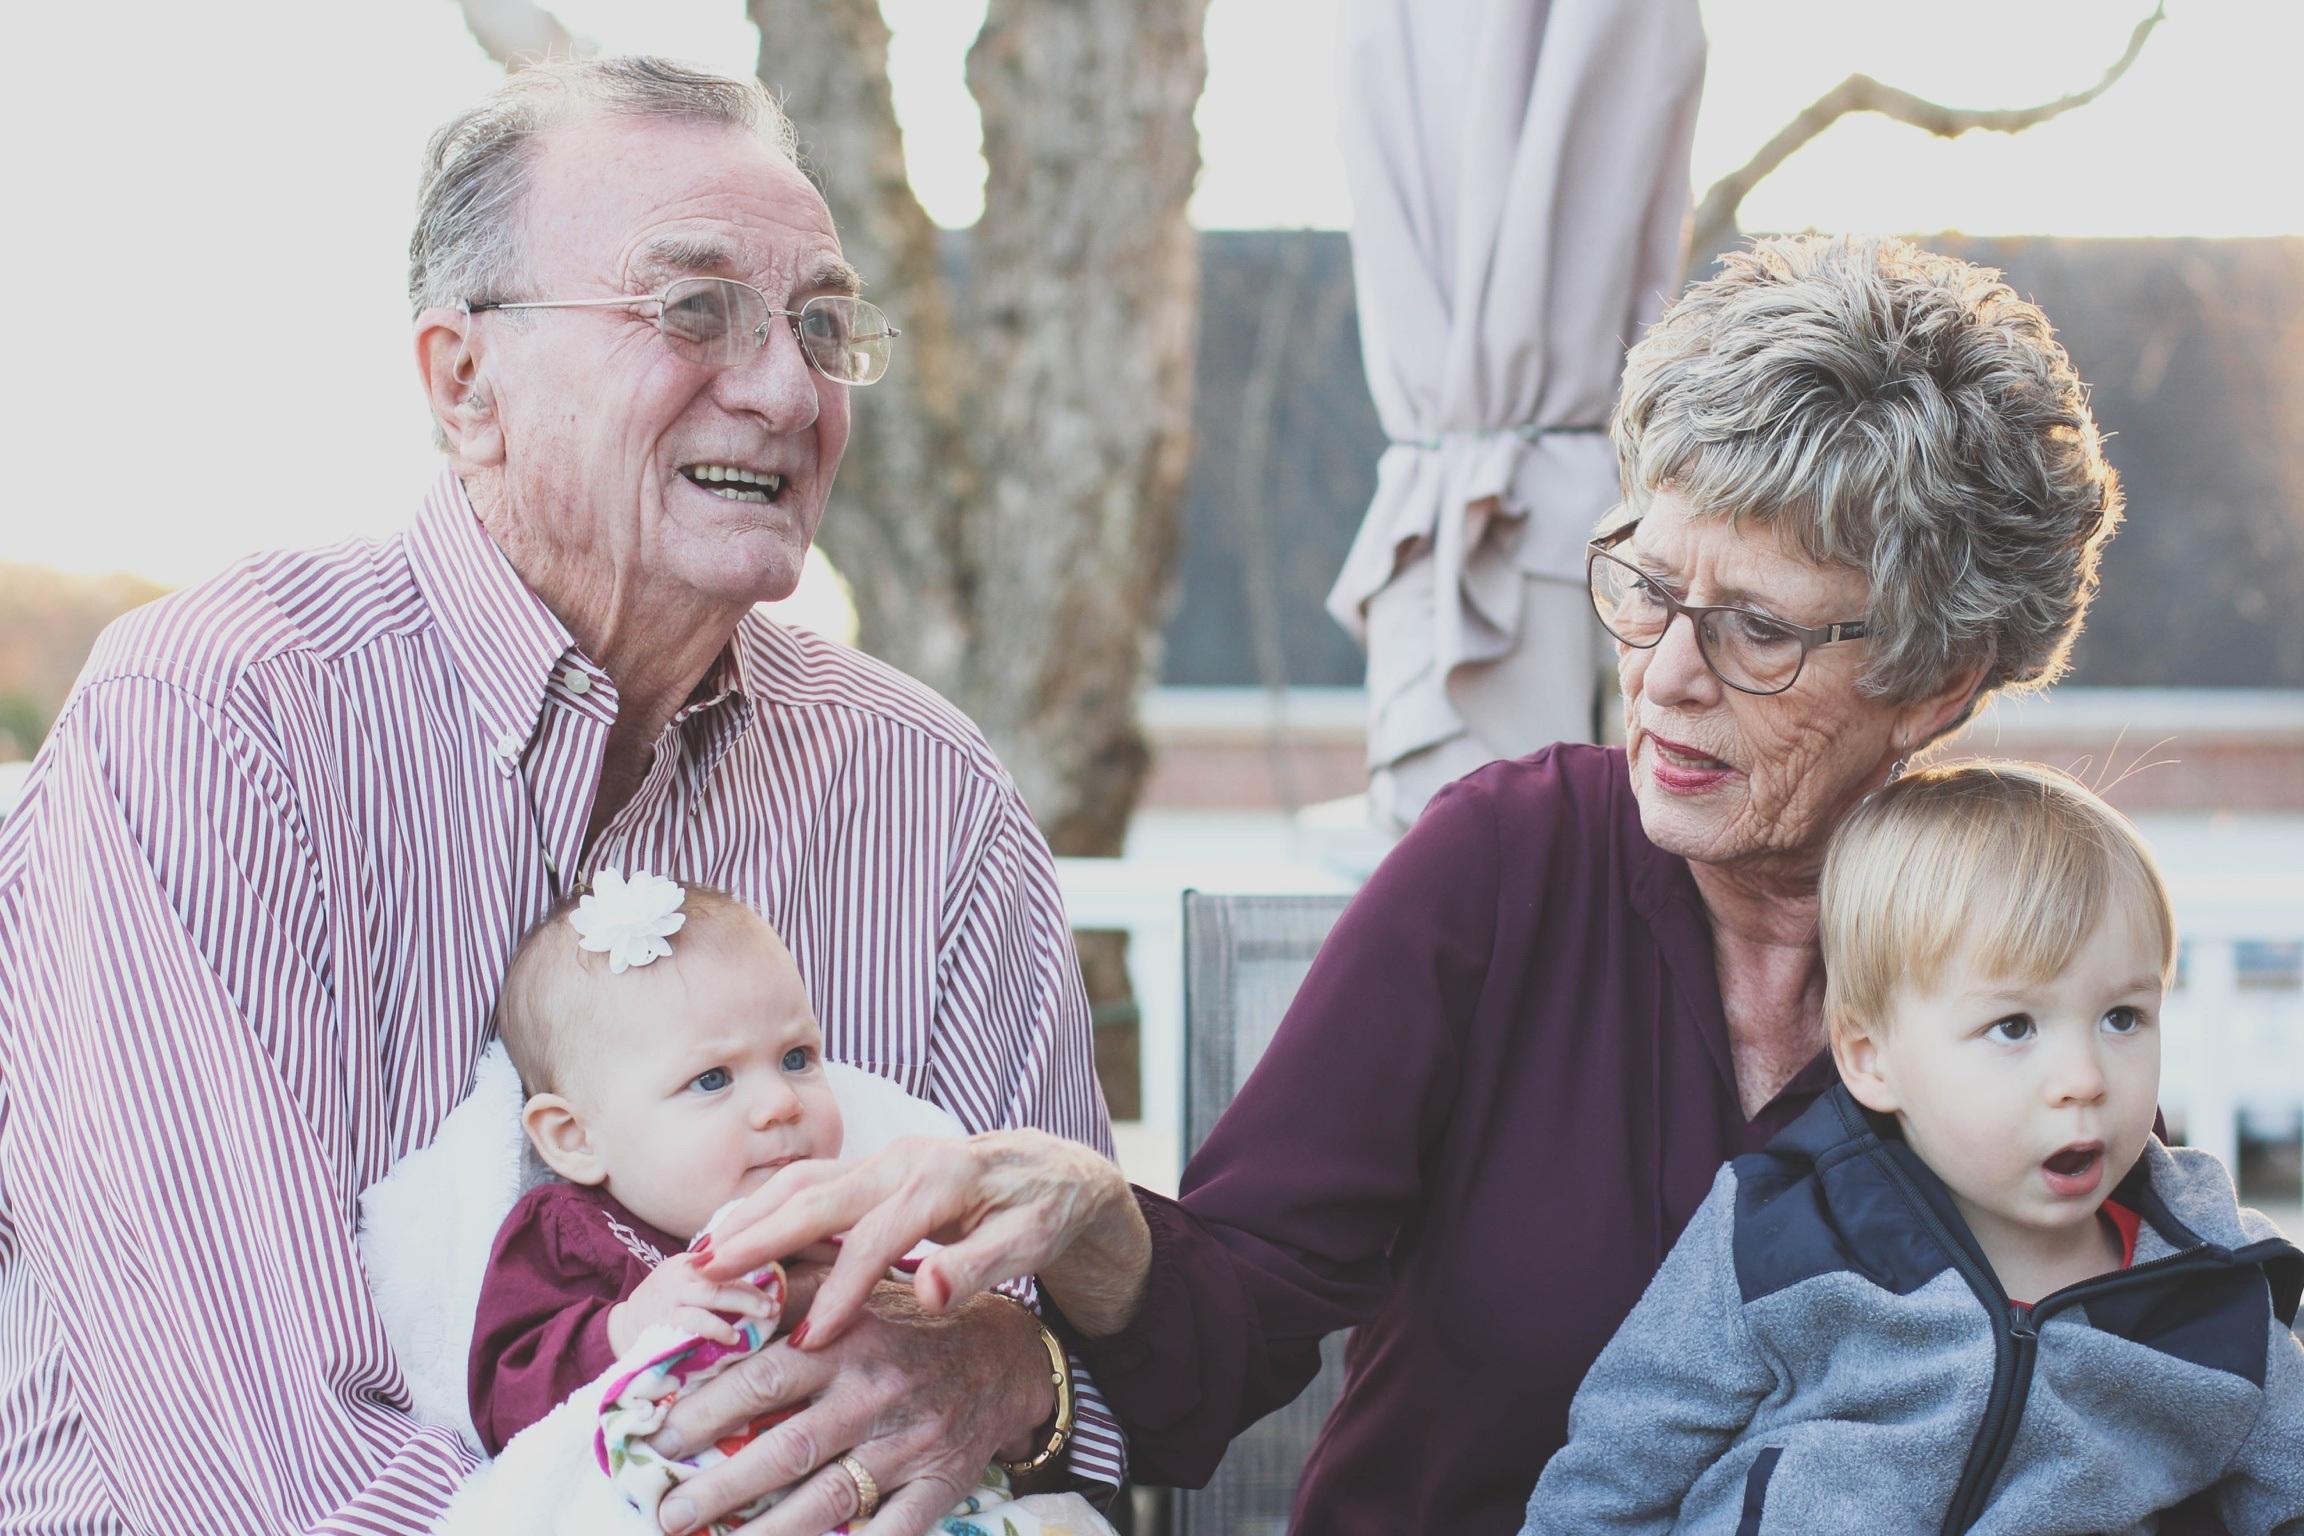 Telltale Signs of Hearing Loss in Seniors